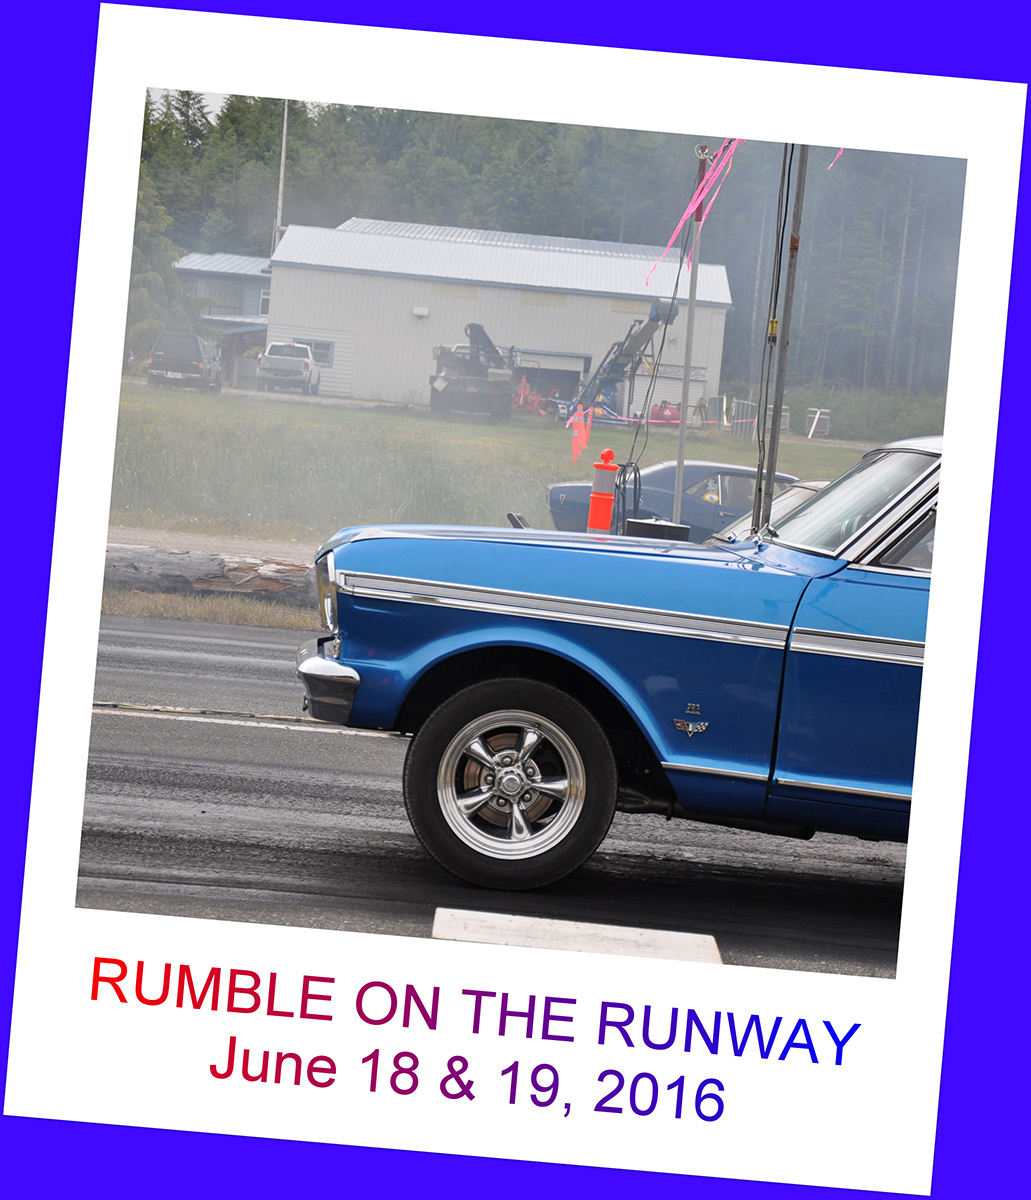 Rumble on the Runway June 18 & 19, 2016 1104